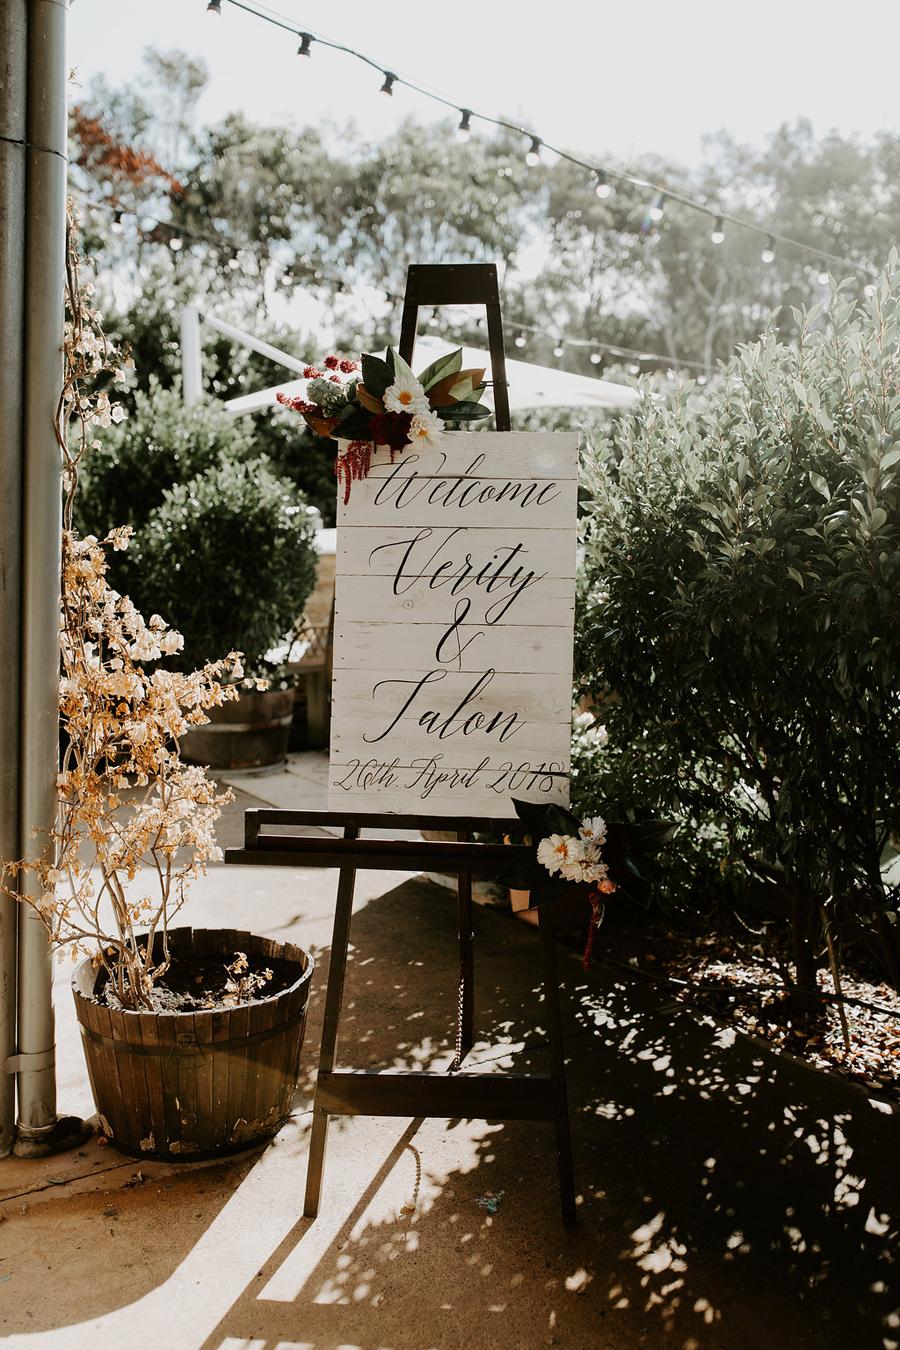 osteria-casuarina-wedding-venue-tweed-coast-weddings-coastal-garden-reception-real-wedding013.jpg